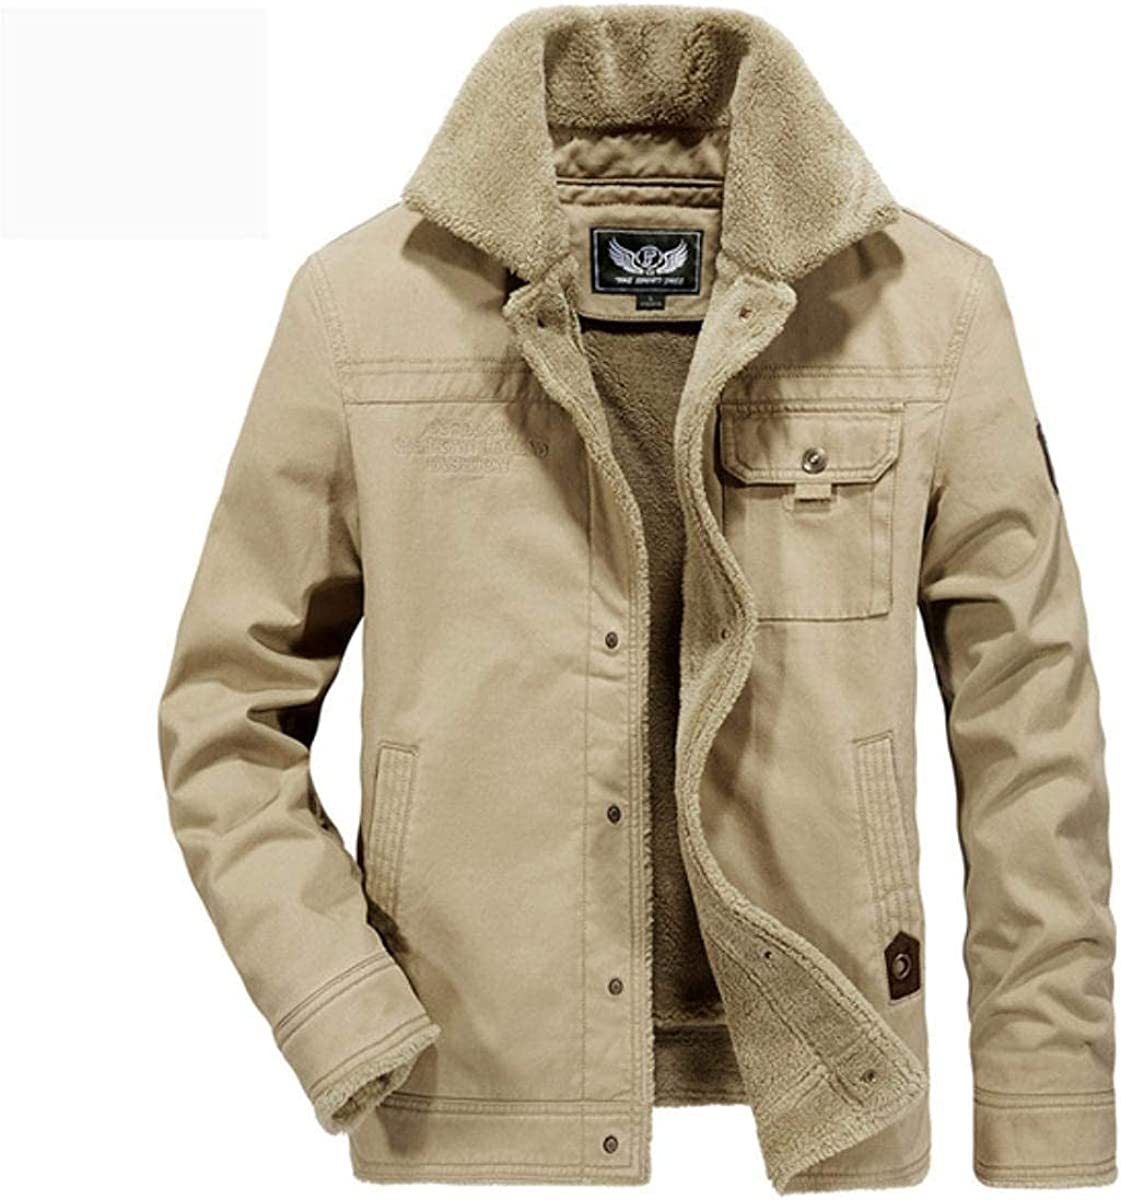 Winter Jacket Men Thick Warm New products, world's highest quality popular! Windbrea Fleece Coat Outwear Weekly update